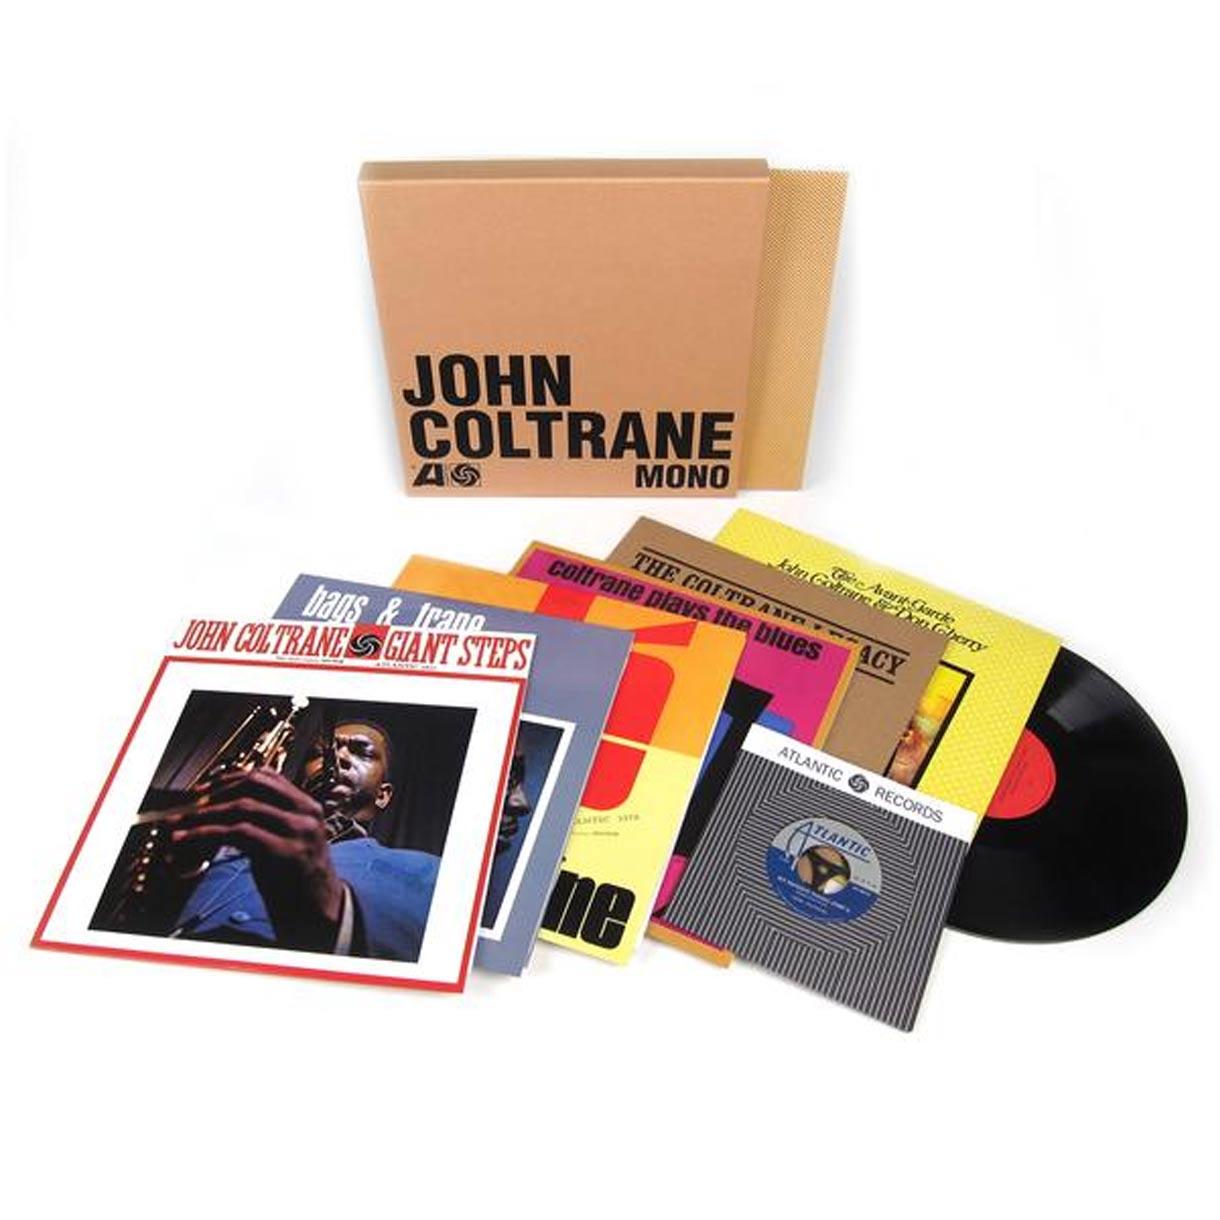 "JOHN COLTRANE The Atlantic Years In Mono"""